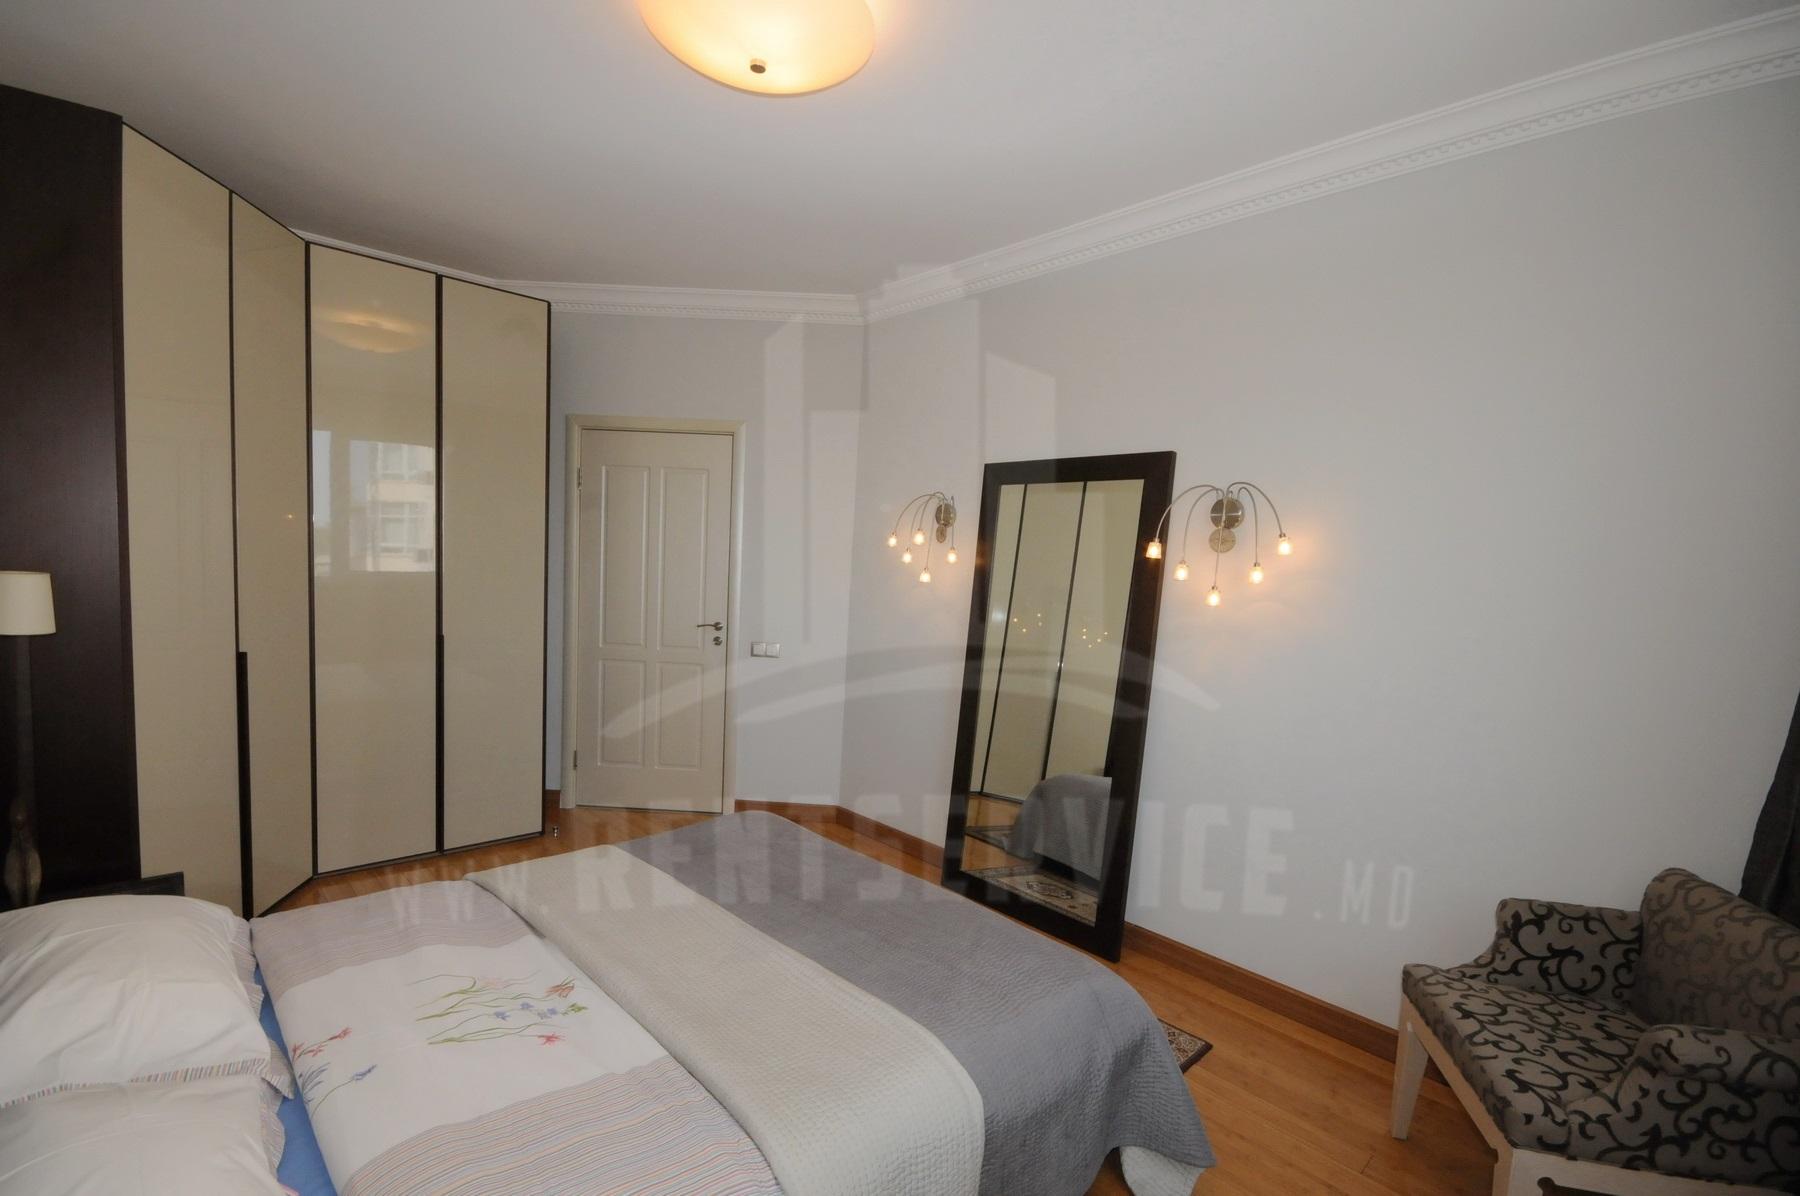 2054_apartment_13.JPG